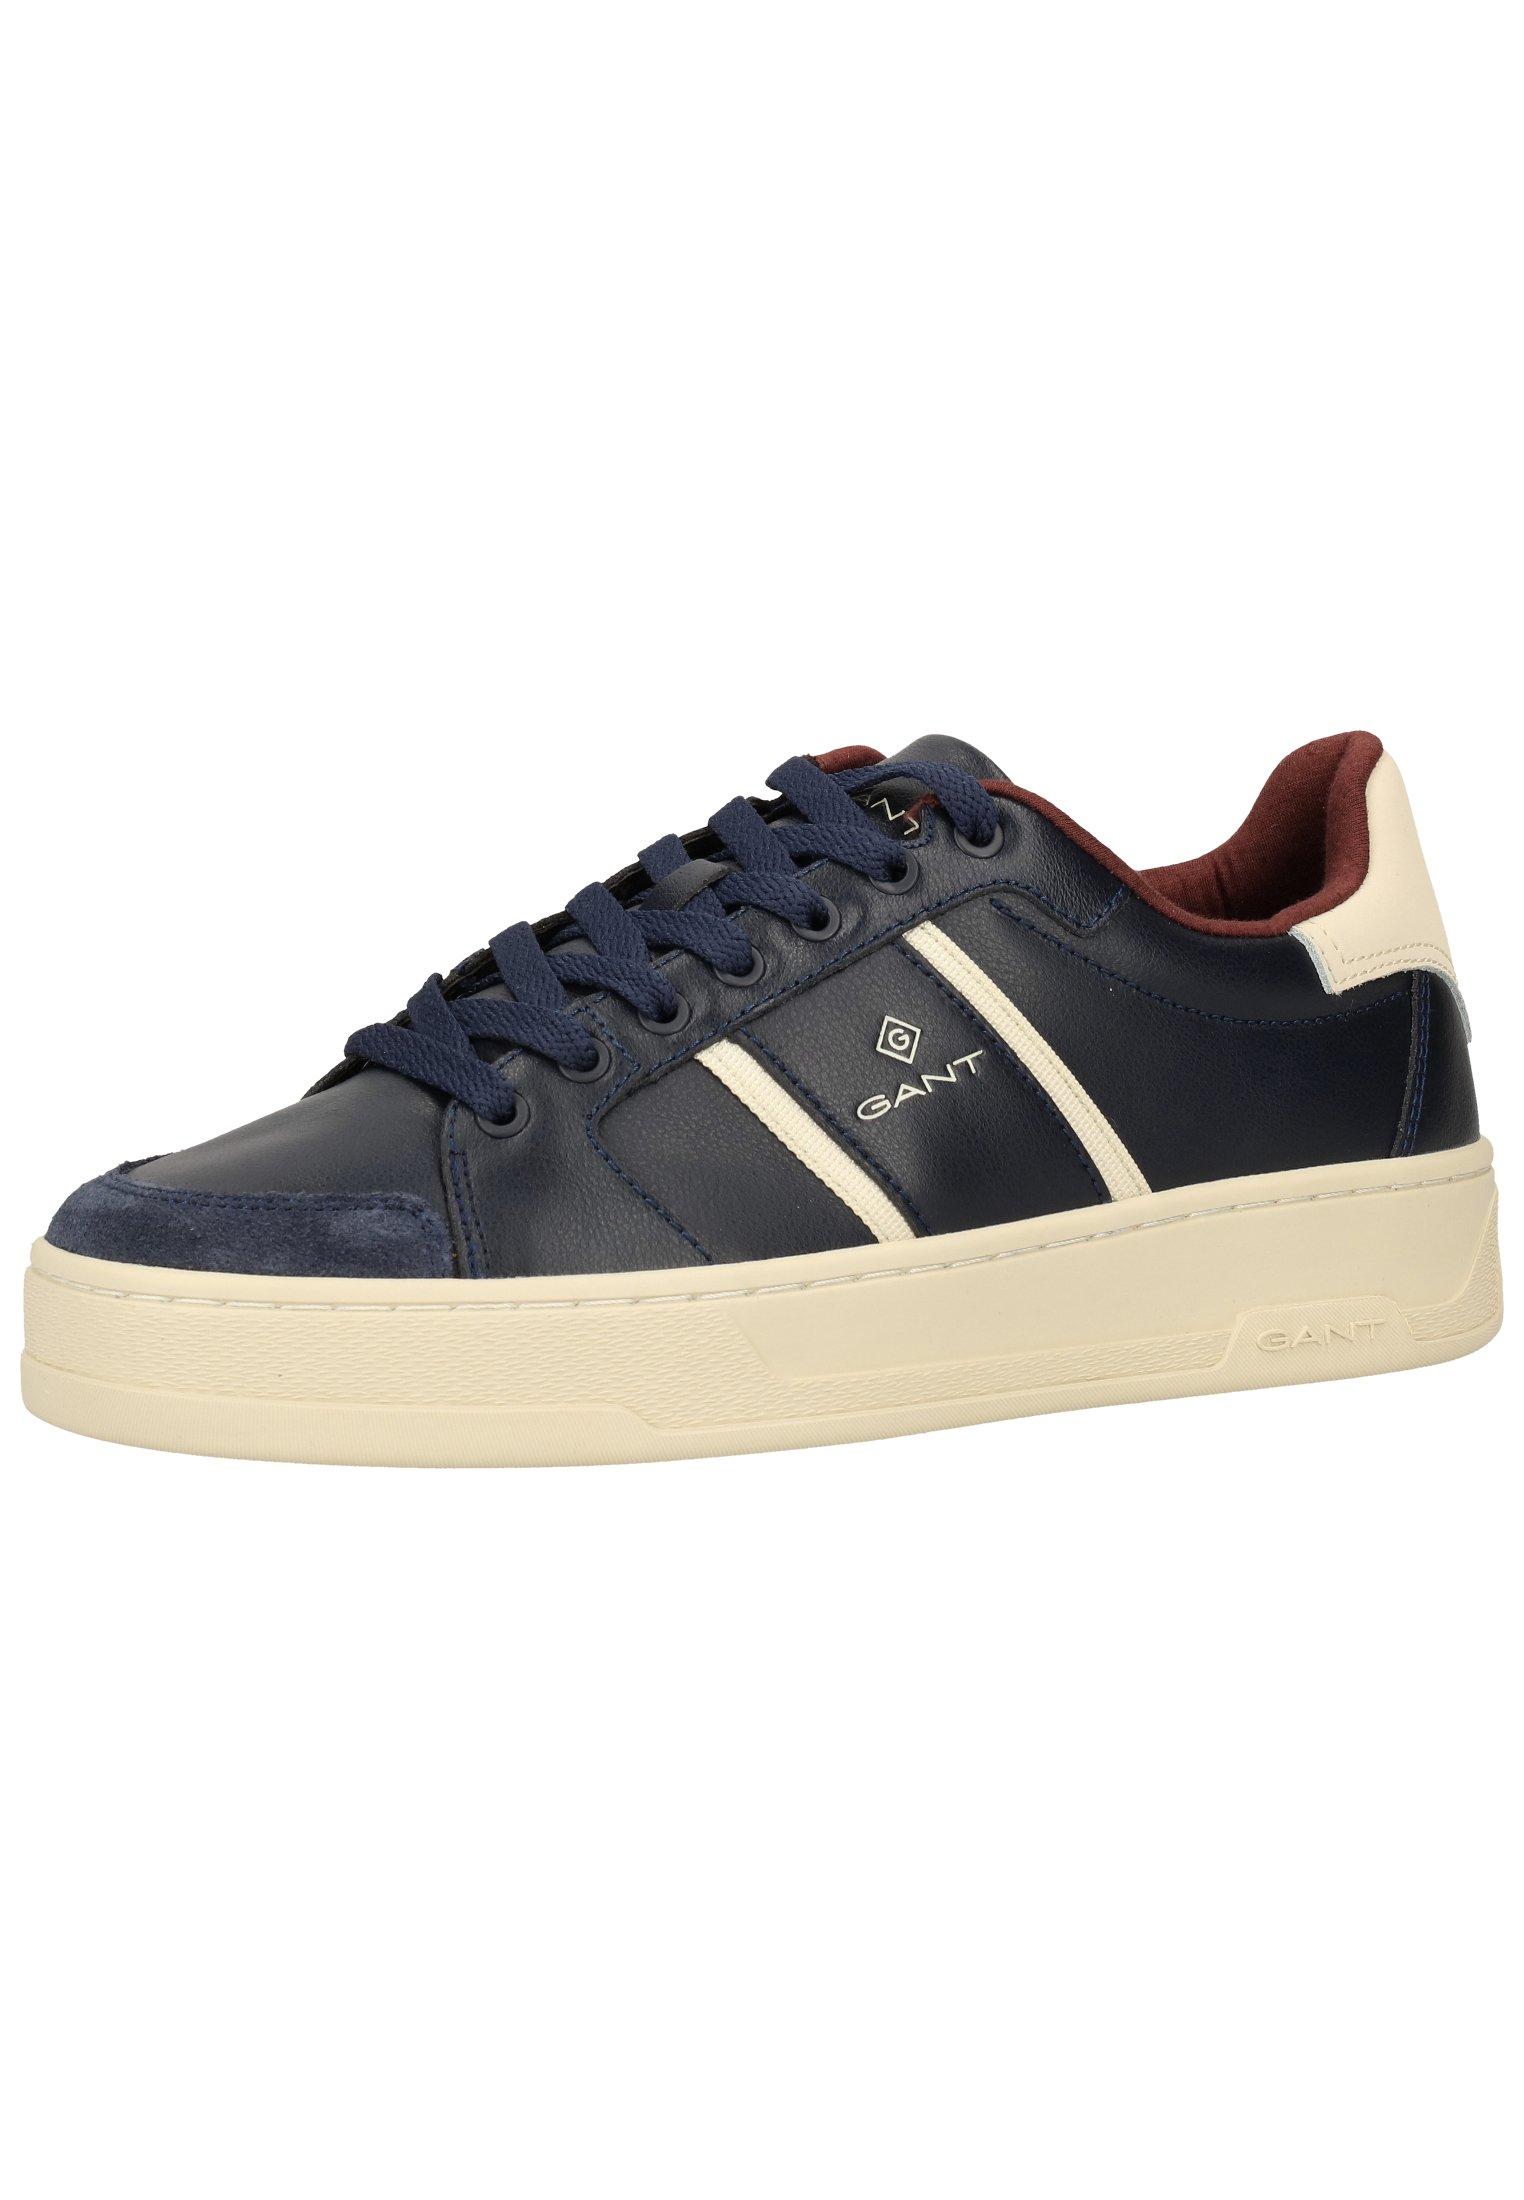 GANT Sneaker low - marine/blau - Herrenschuhe NunI0